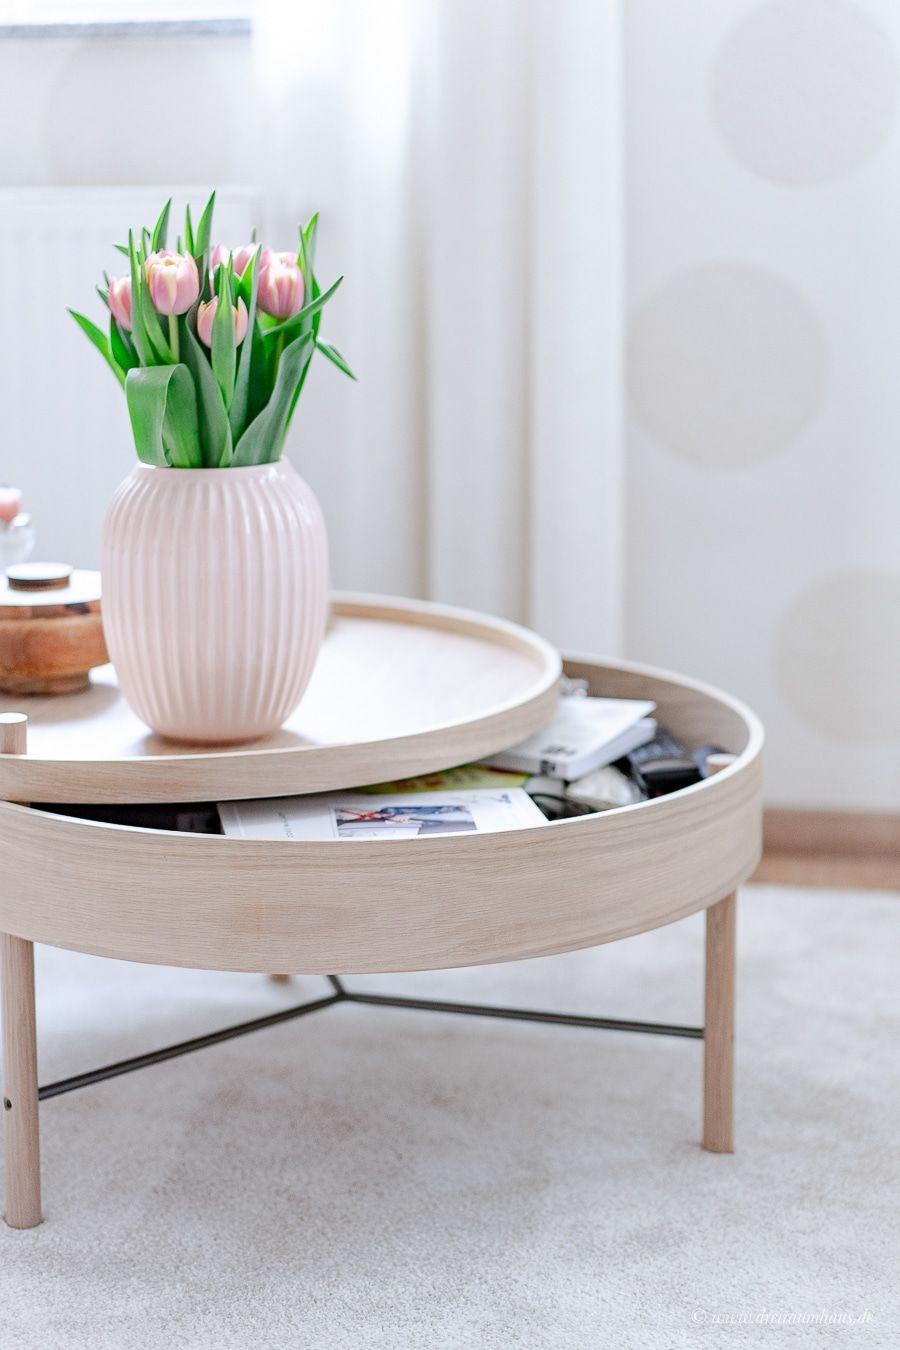 Dekosamstag Diese 10 Couchtische Bedeuten Wohngluck Couchtisch Stauraum Couchtische Ikea Couchtisch